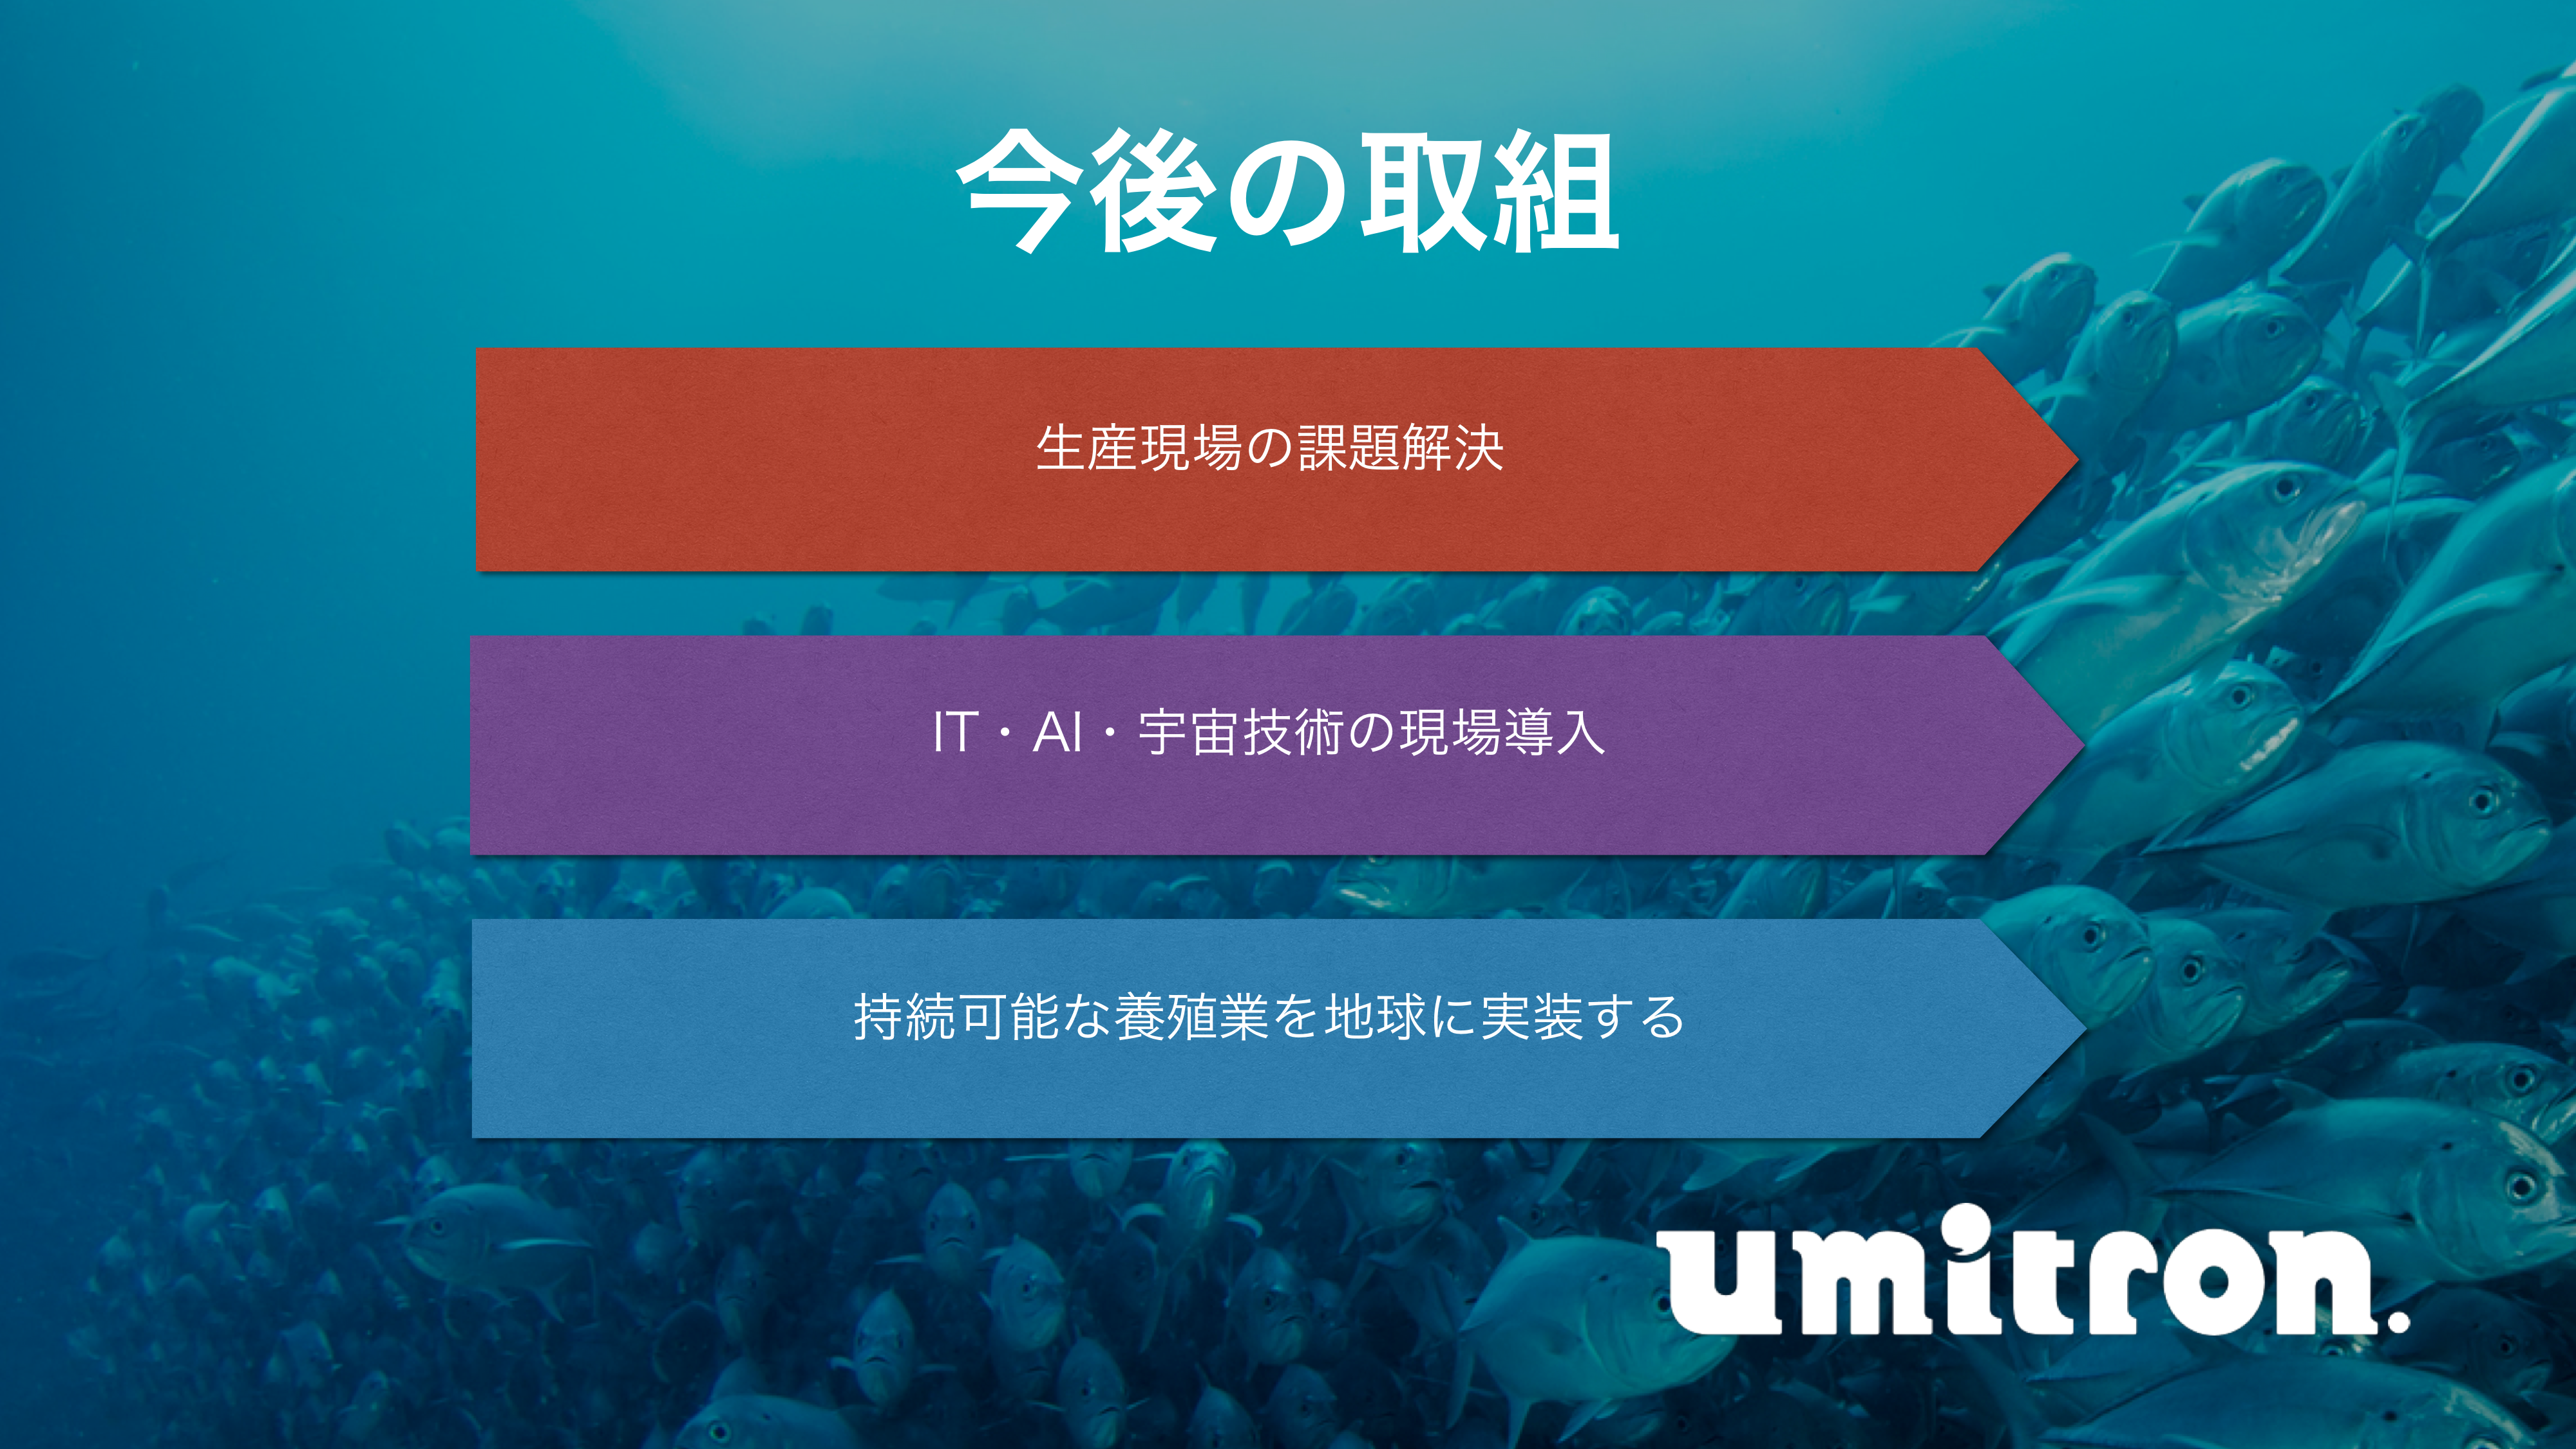 f:id:Imamura:20181220152528p:plain